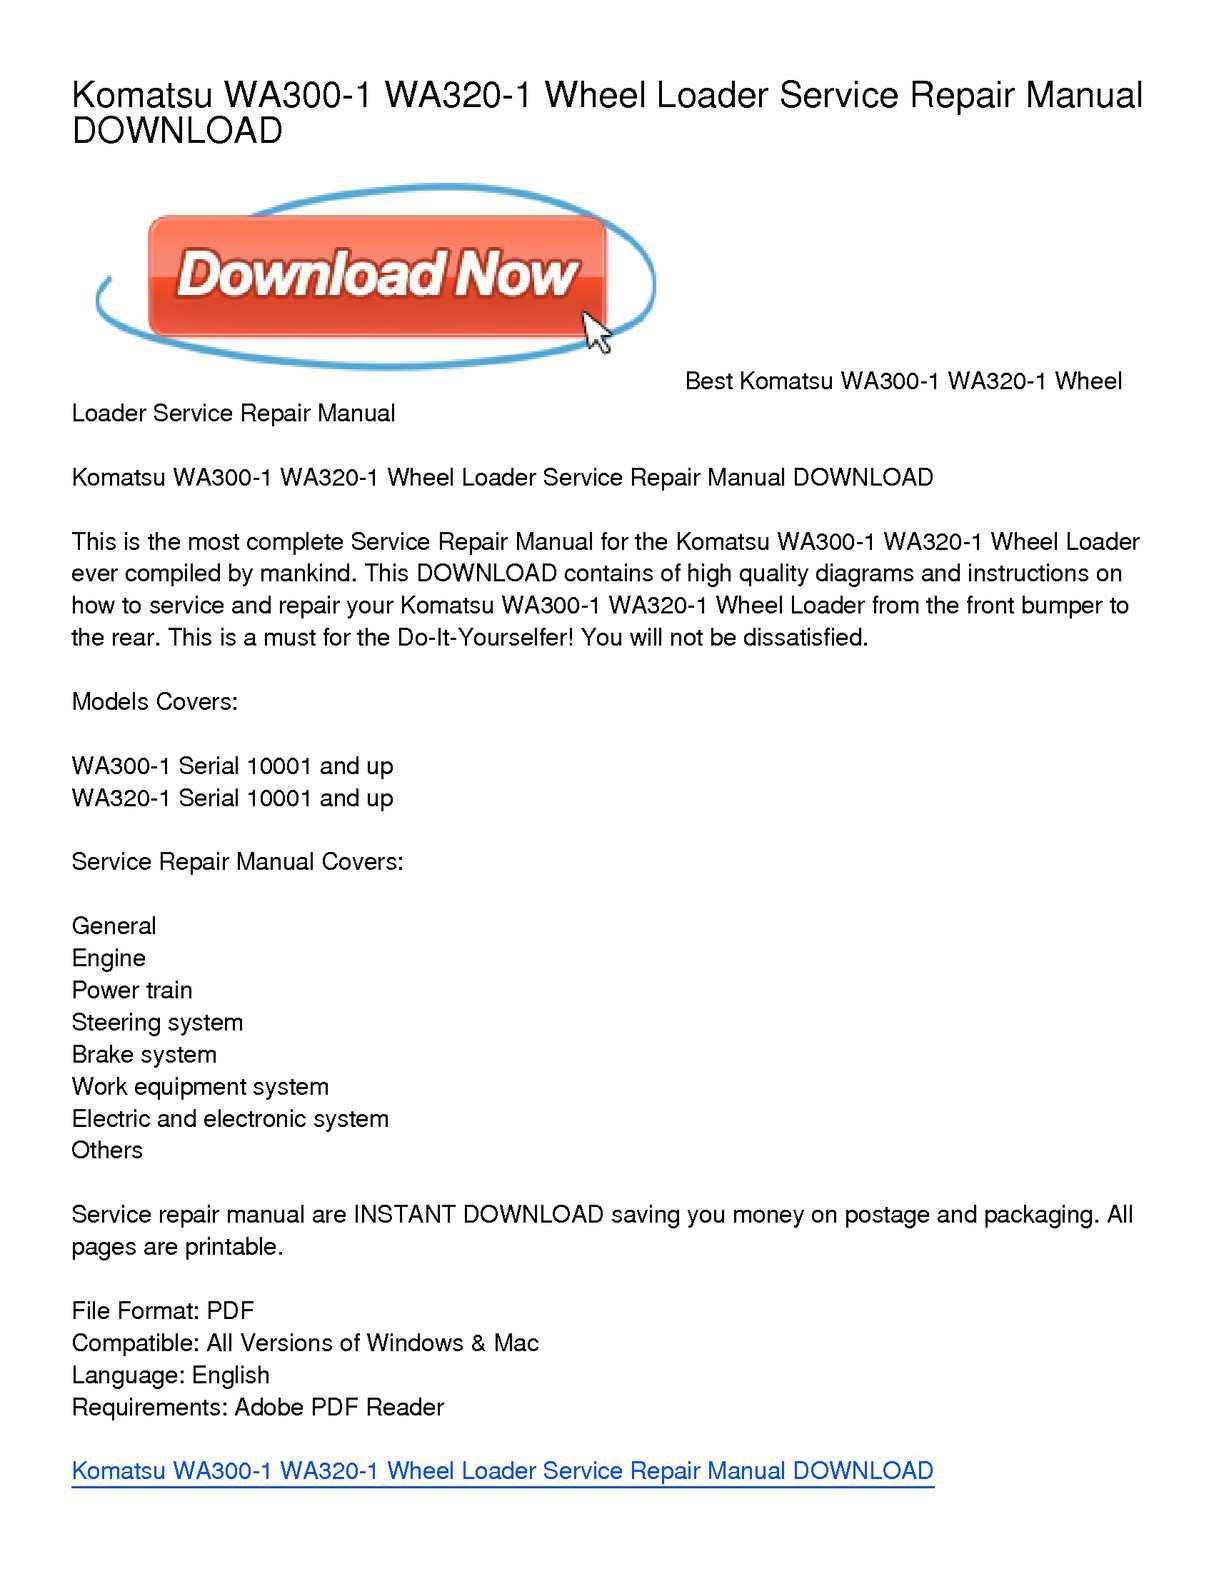 Calaméo - Komatsu WA300-1 WA320-1 Wheel Loader Service Repair Manual  DOWNLOAD